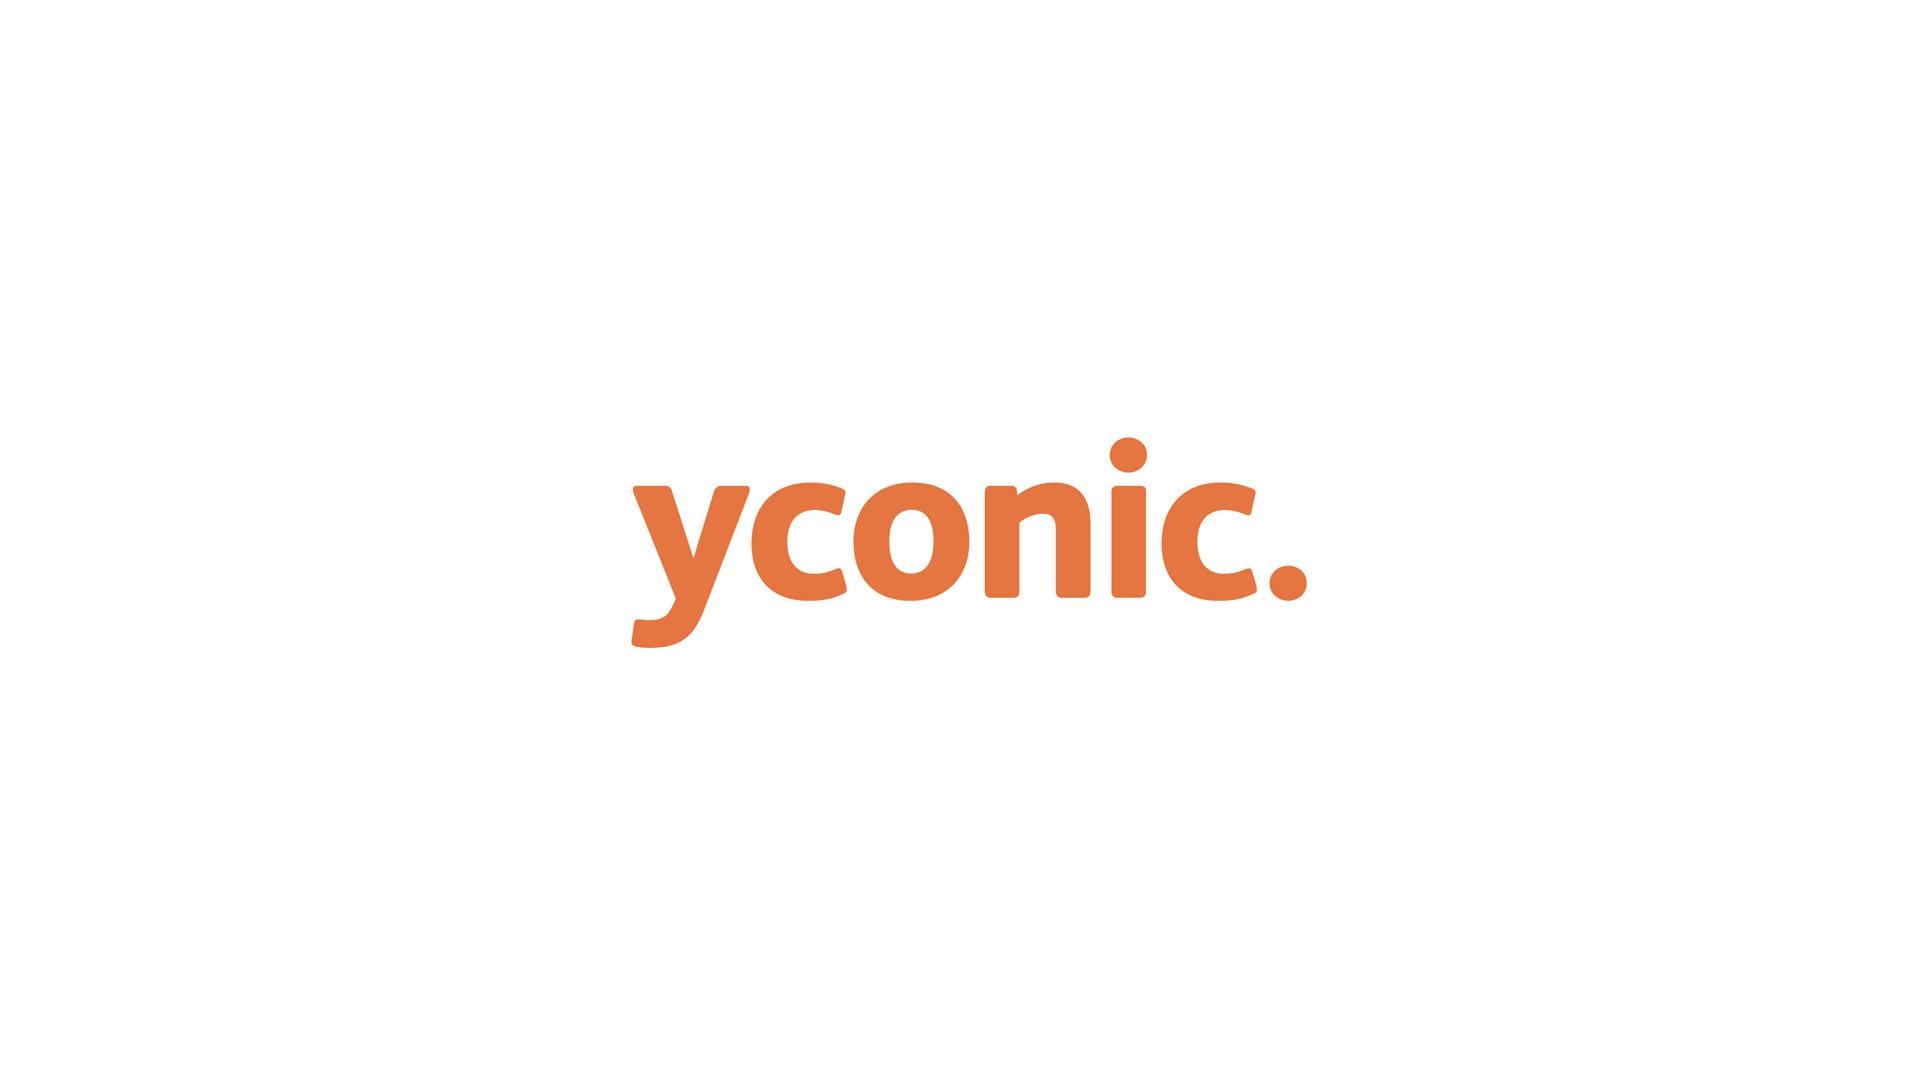 yconic logo